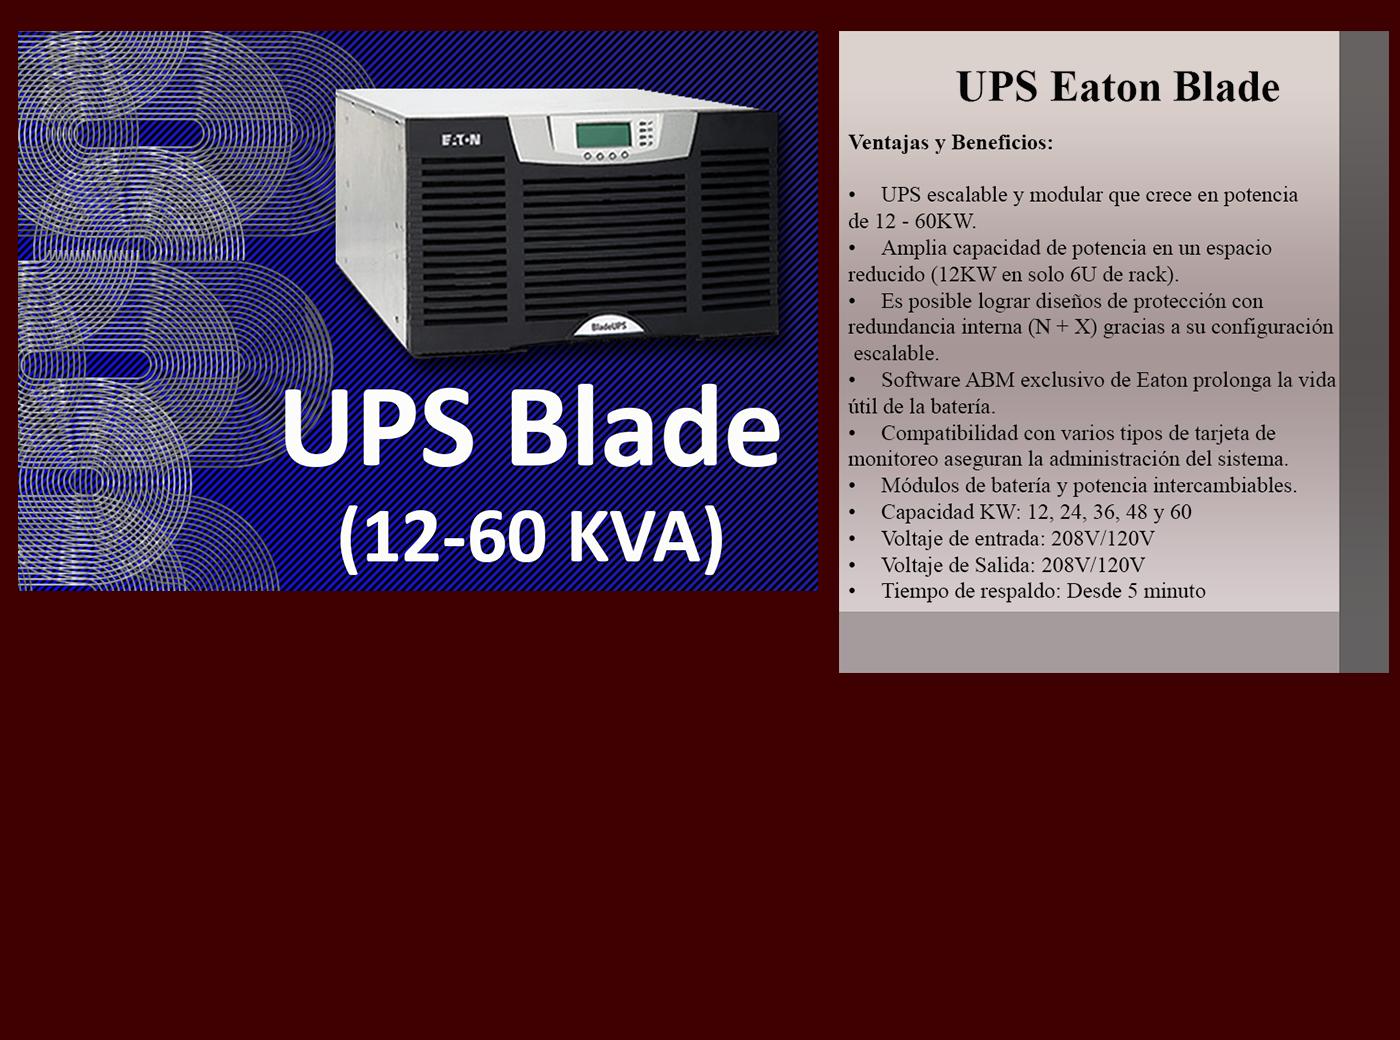 UPS BLADE (12-60 KVA)